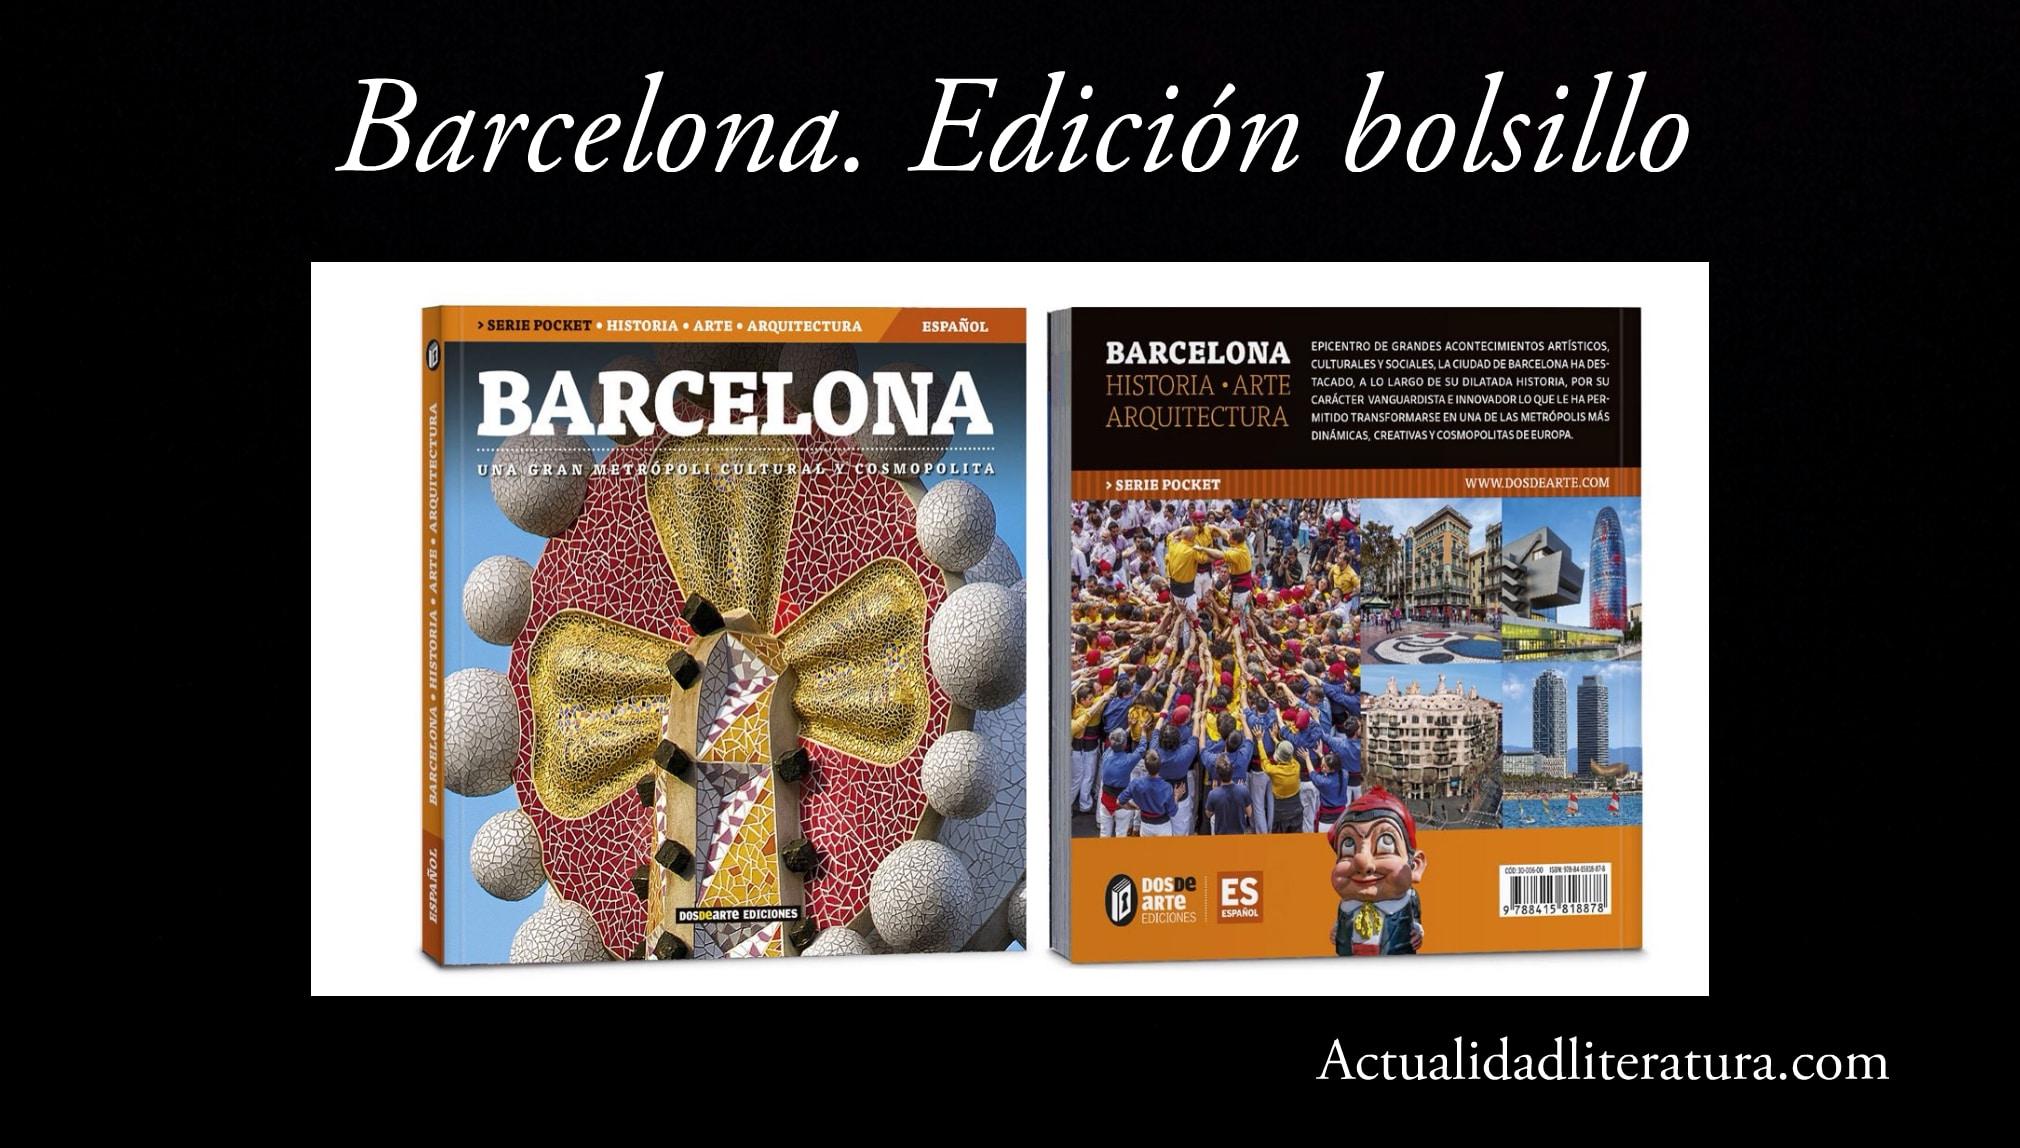 Barcelona. Edicion de bolsillo.